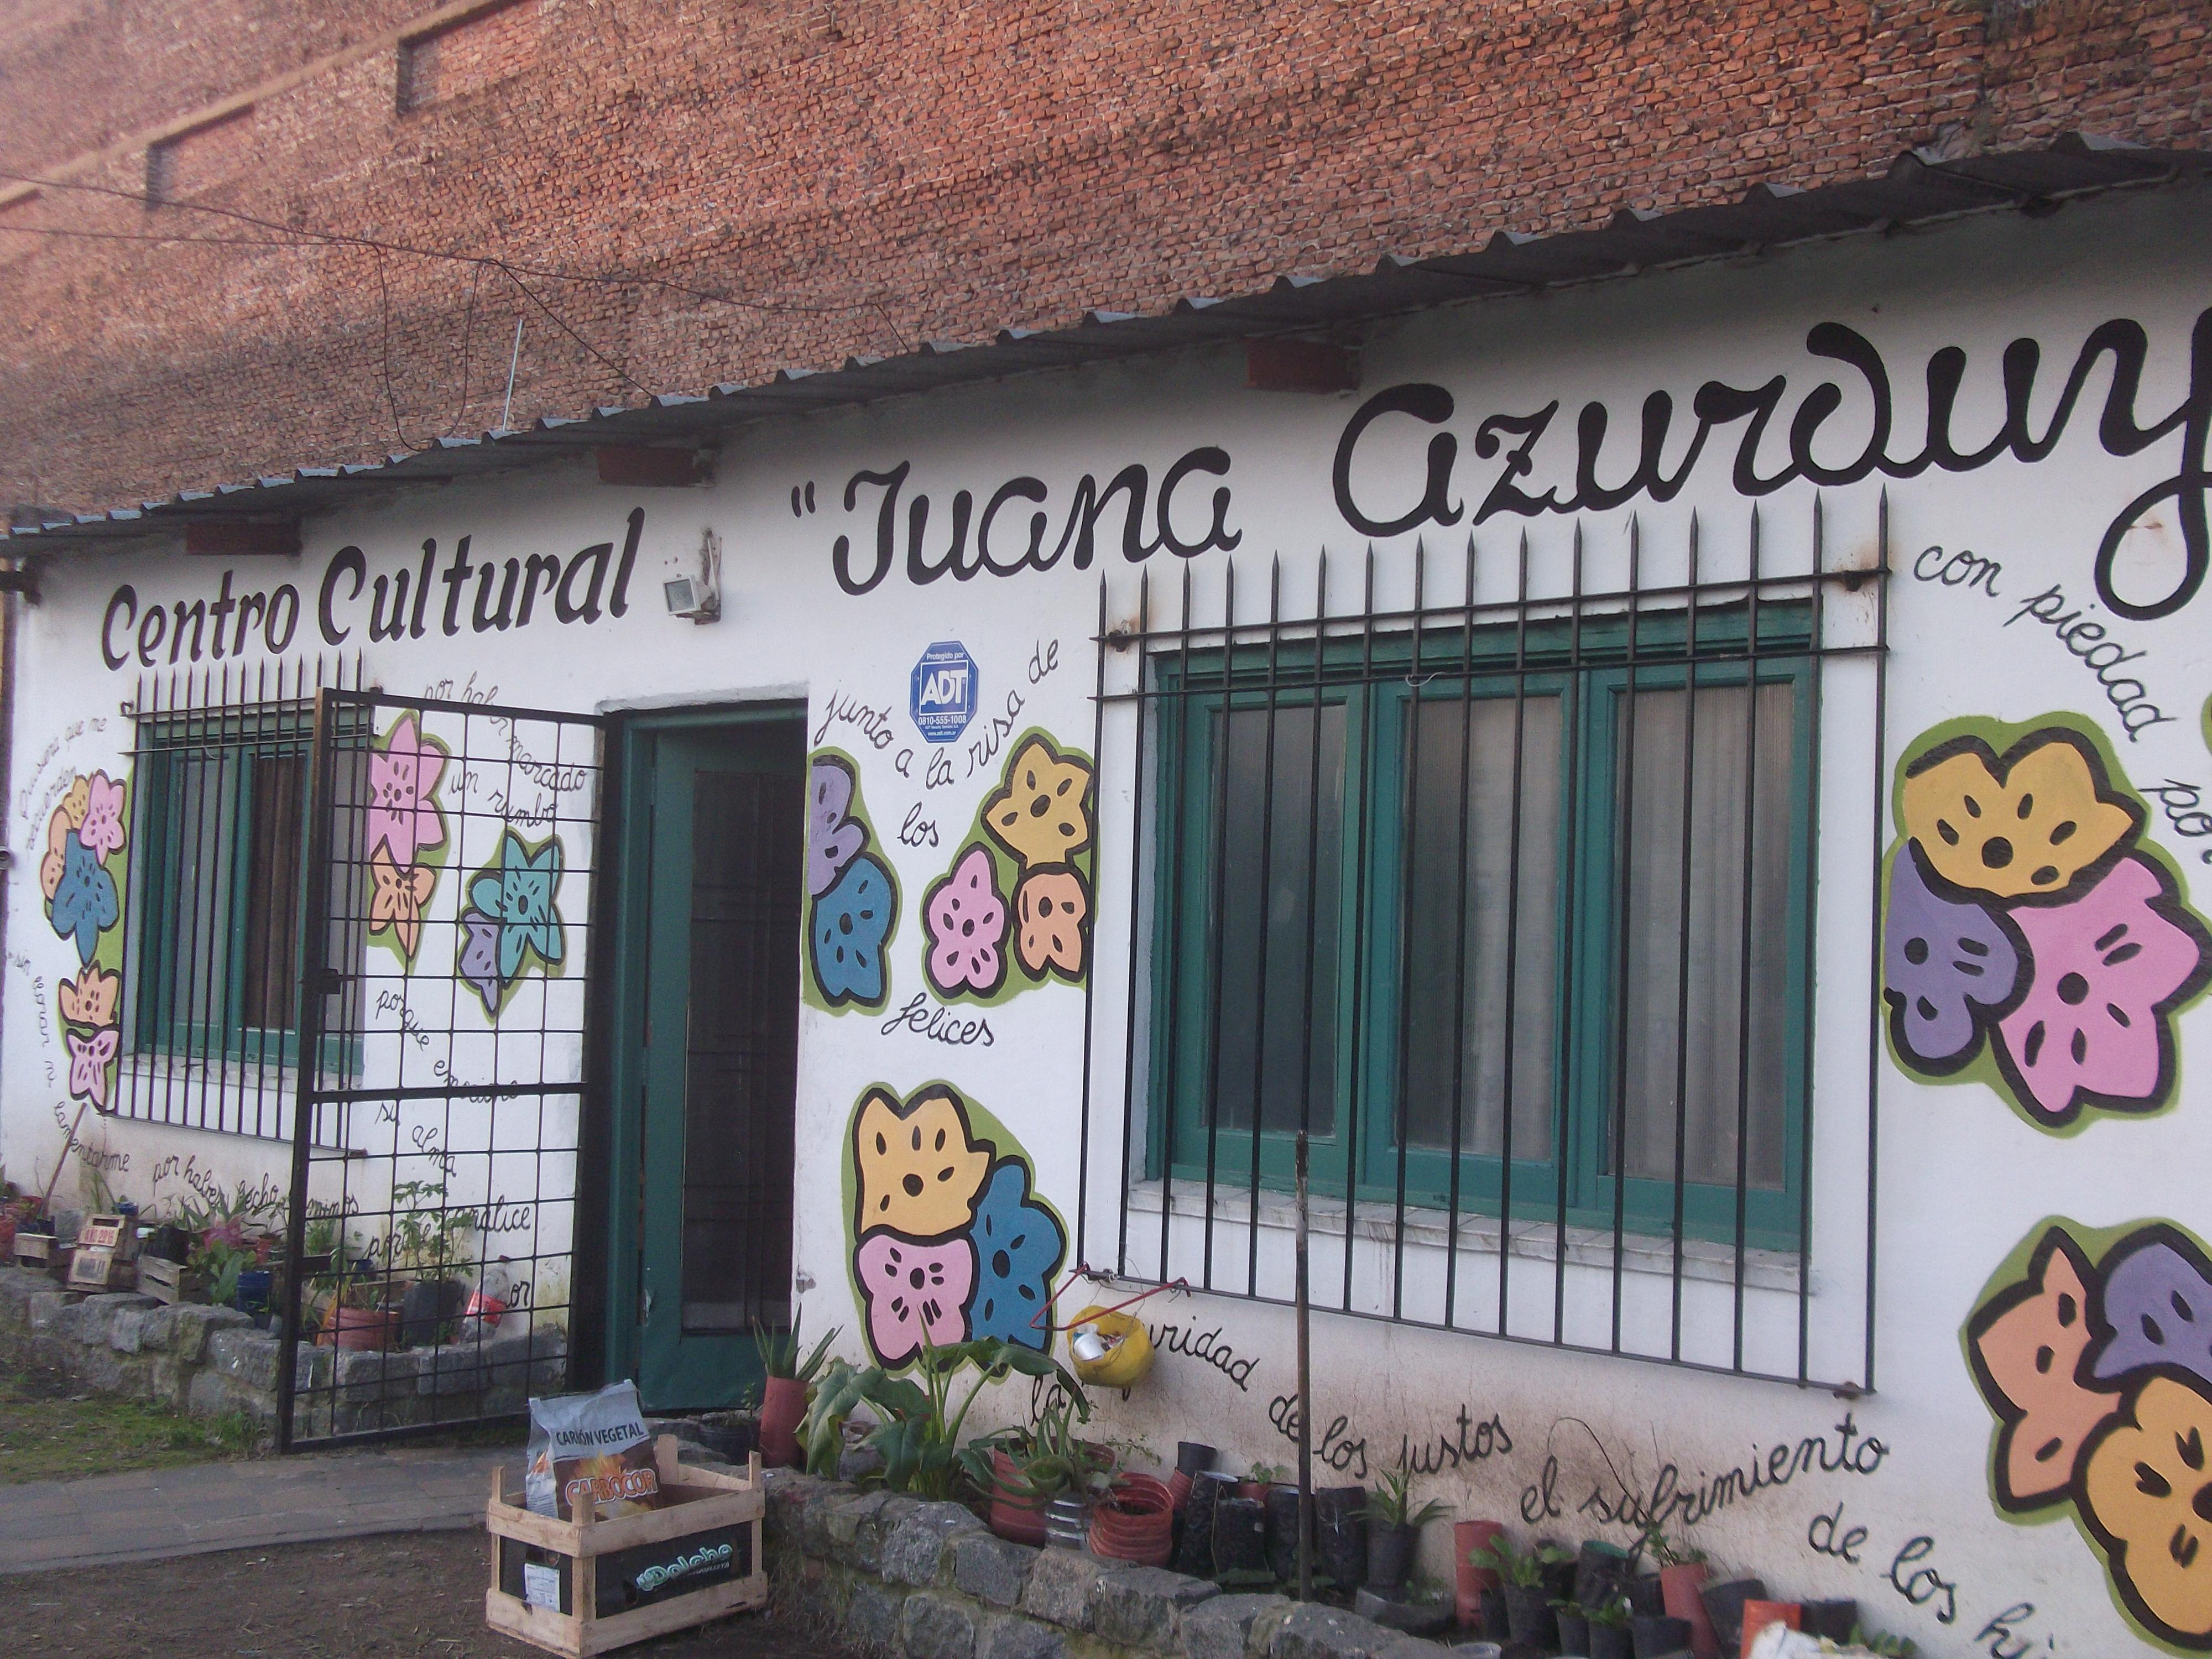 Centro Cultural Juana Azurduy - Centro Cultural Juana Azurduy